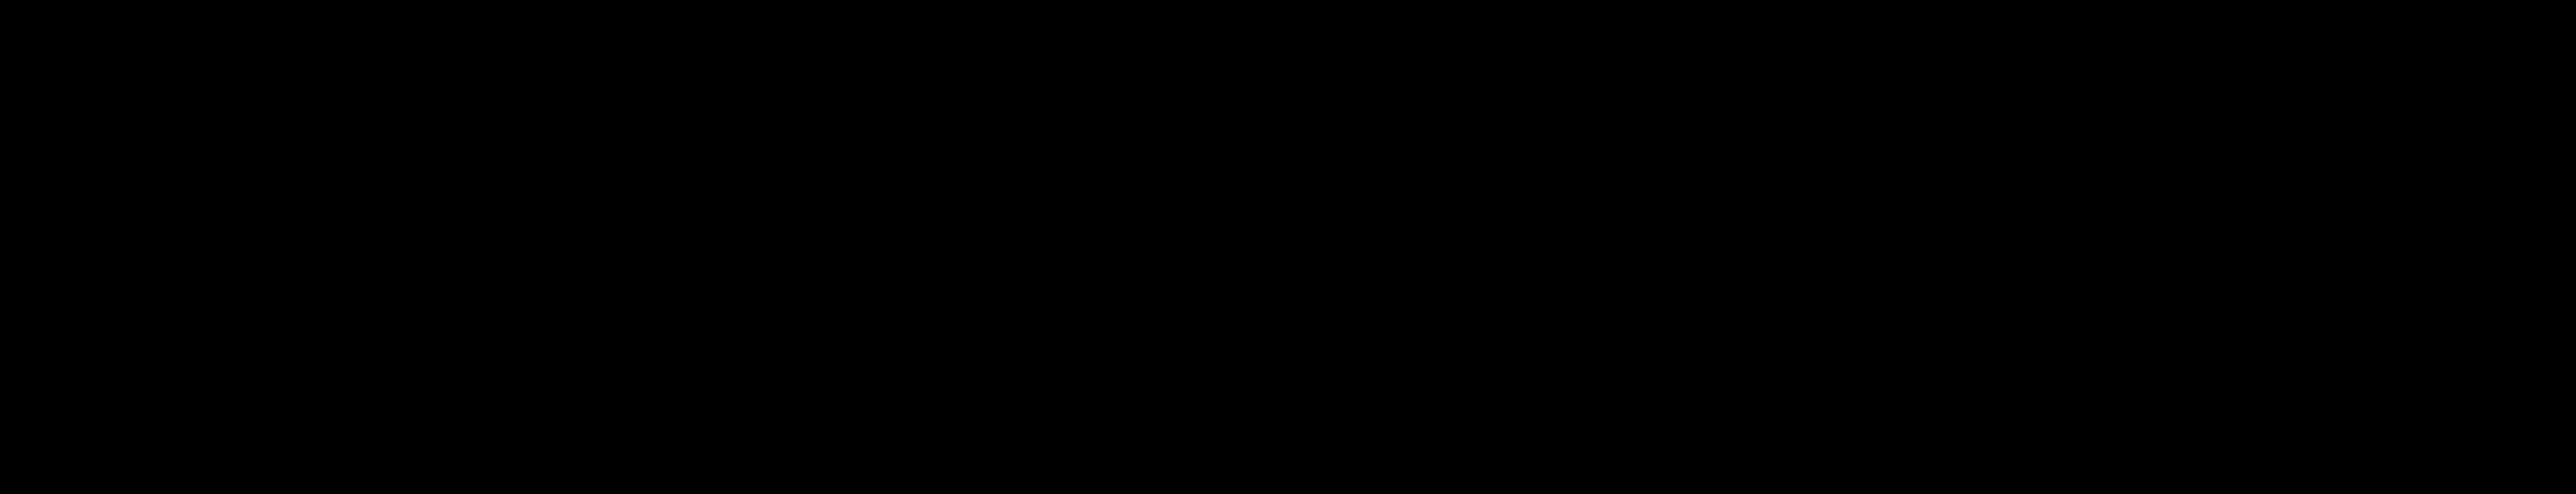 pointandpoem-floralelements-46-.png